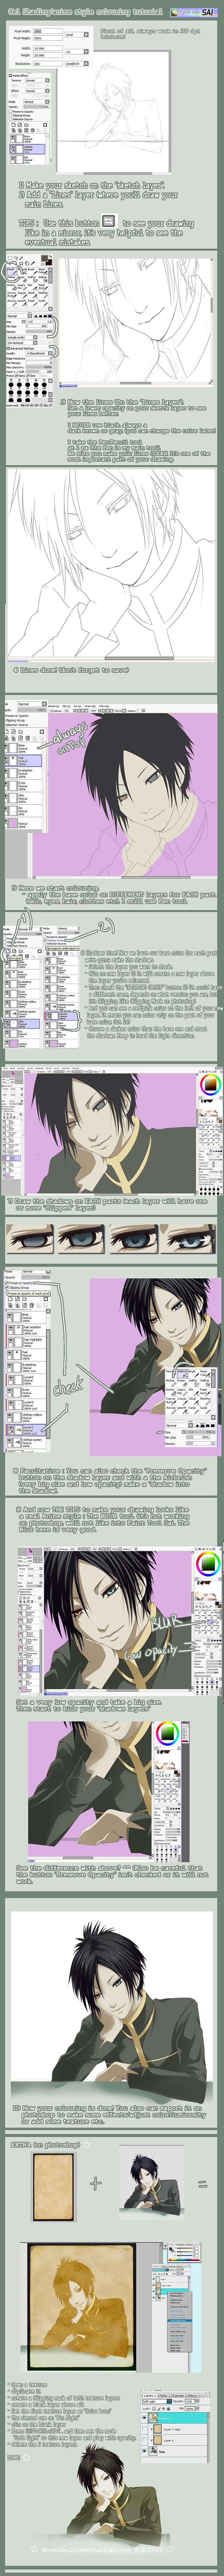 Anime Style Colouring Tutorial By Kuro Mai Deviantart Com On Deviantart Coloring Tutorial Anime Style Tutorial